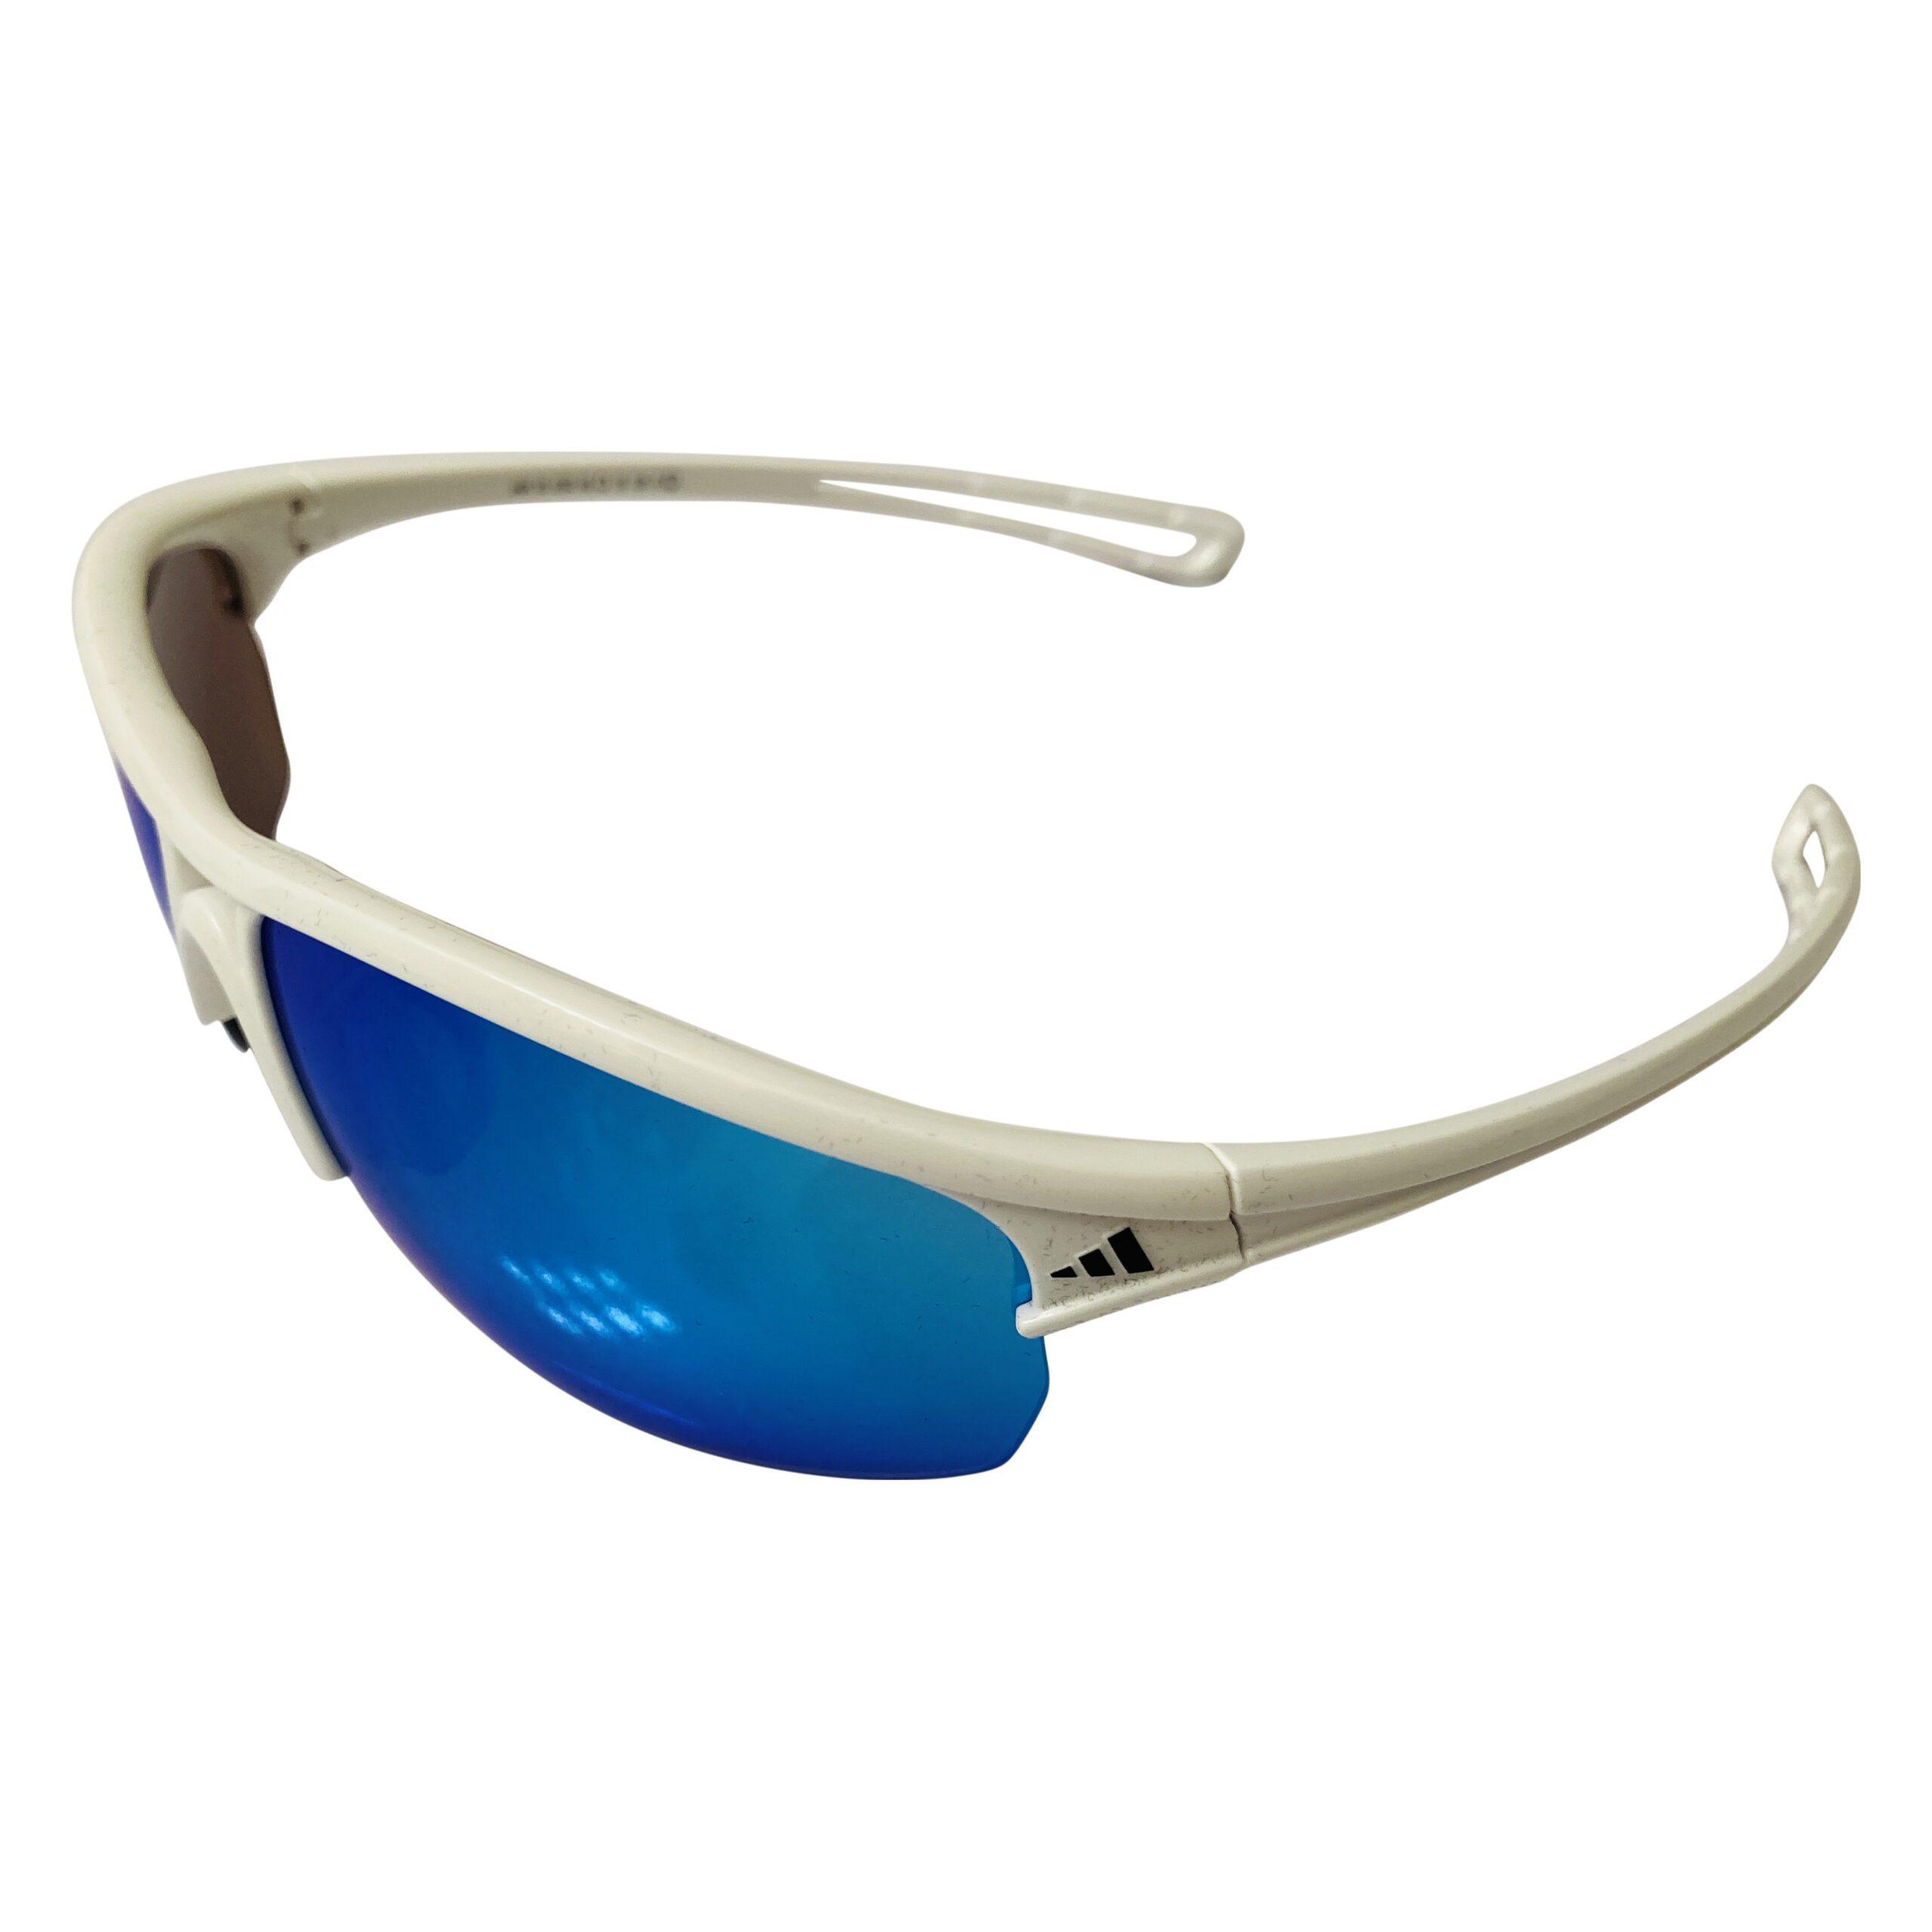 Adidas Raylor L Sunglasses - Shiny White Frame - Blue Lens A404/05